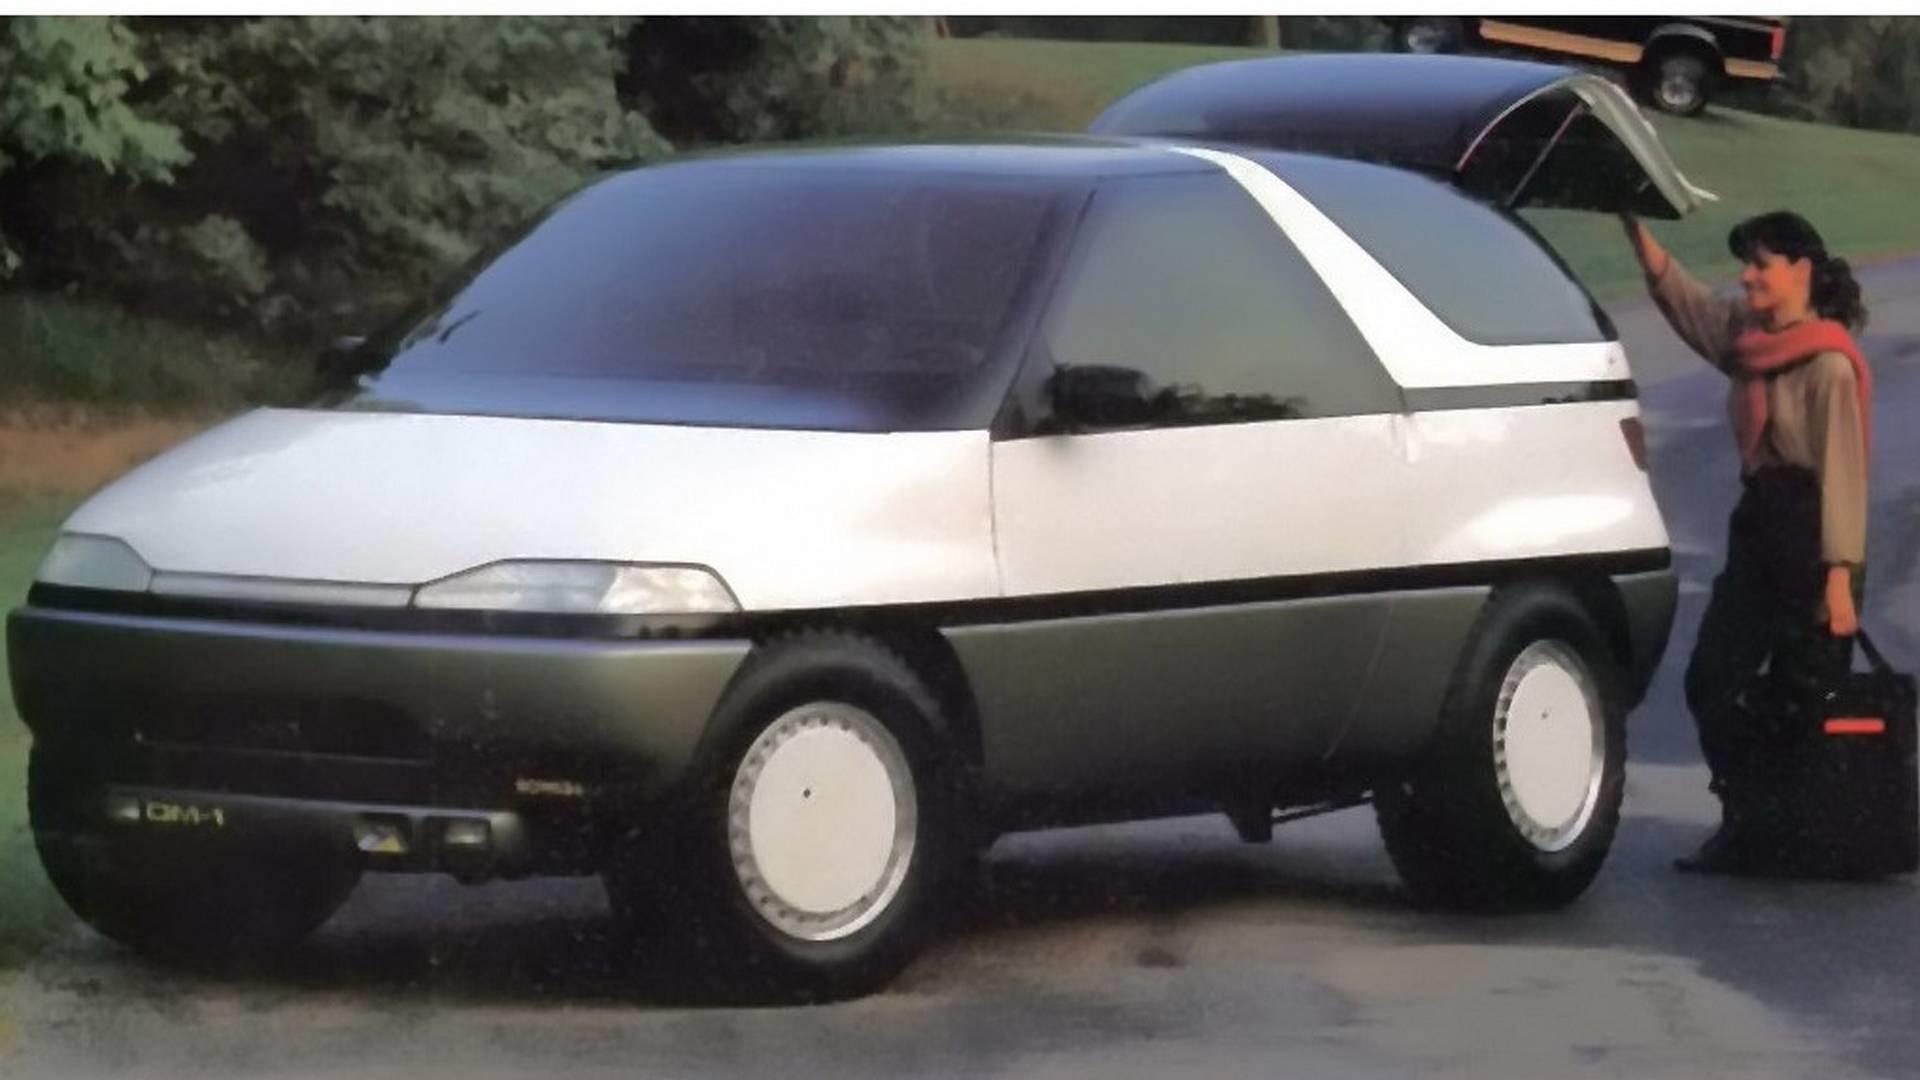 Ford Bronco DM-1 1988